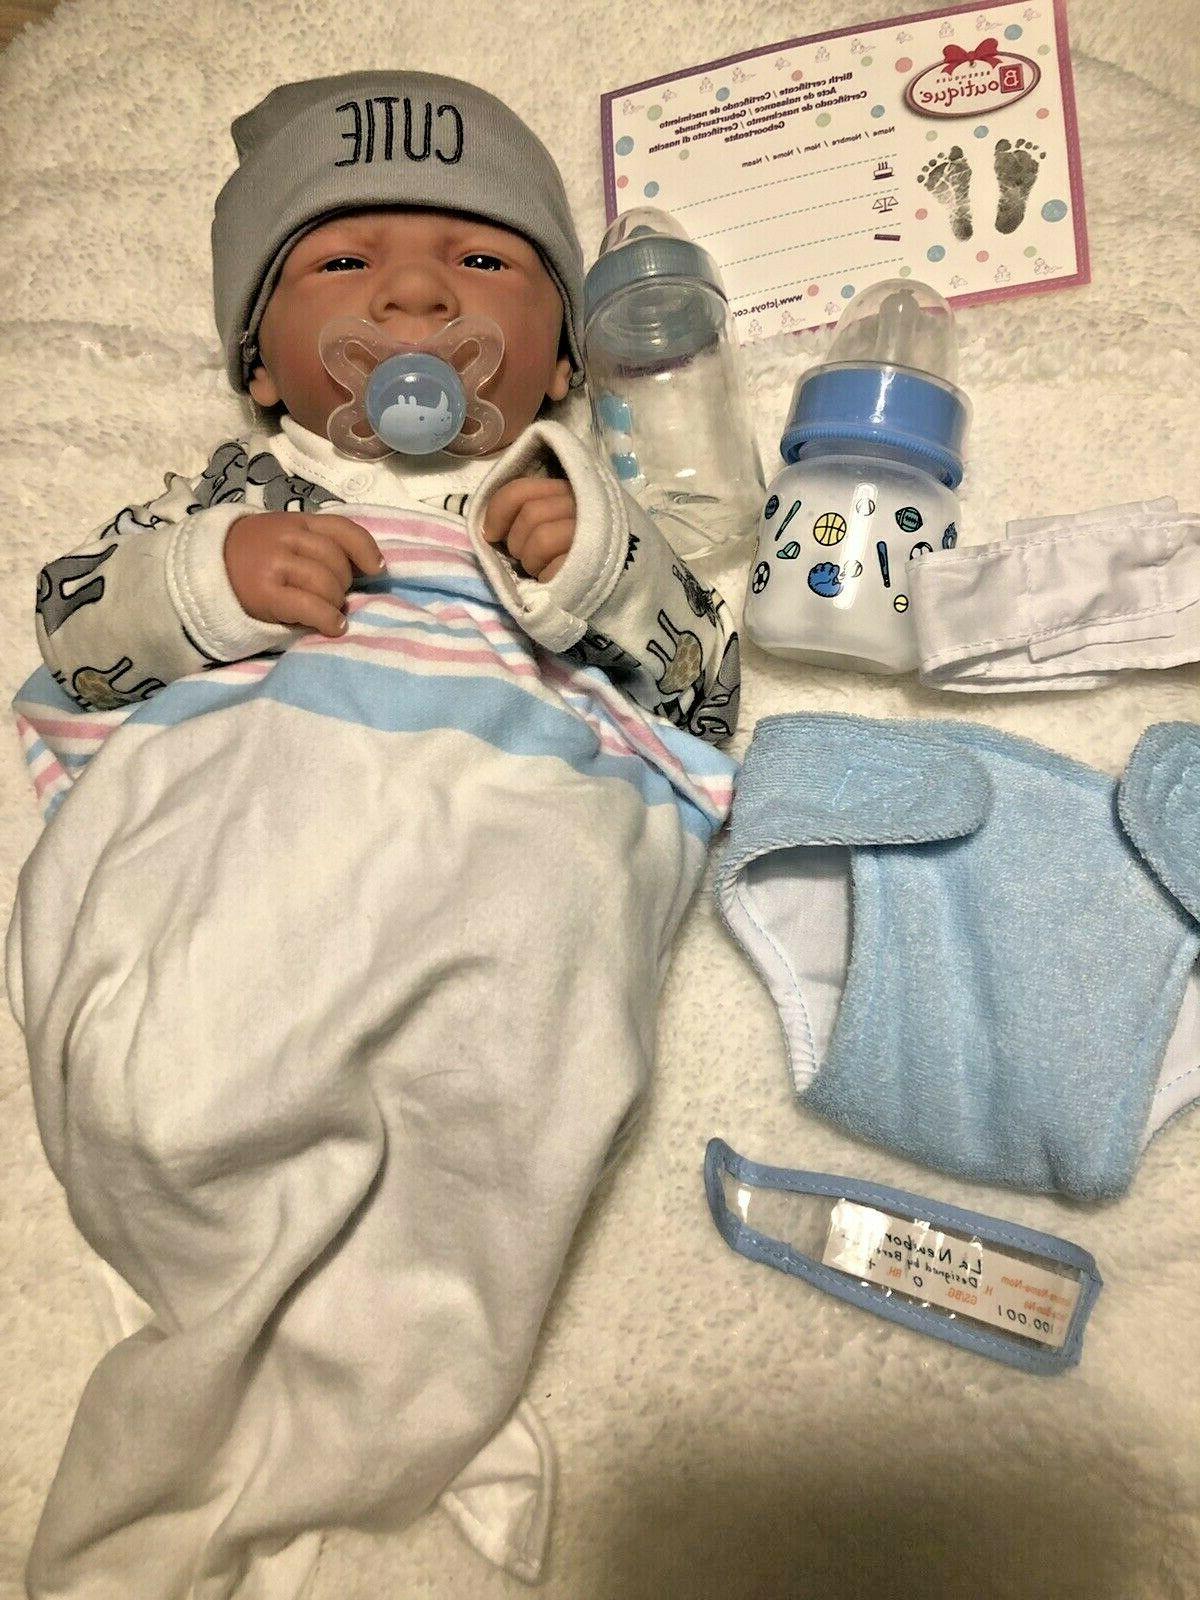 AWW! Preemie Life Like Reborn Pacifier